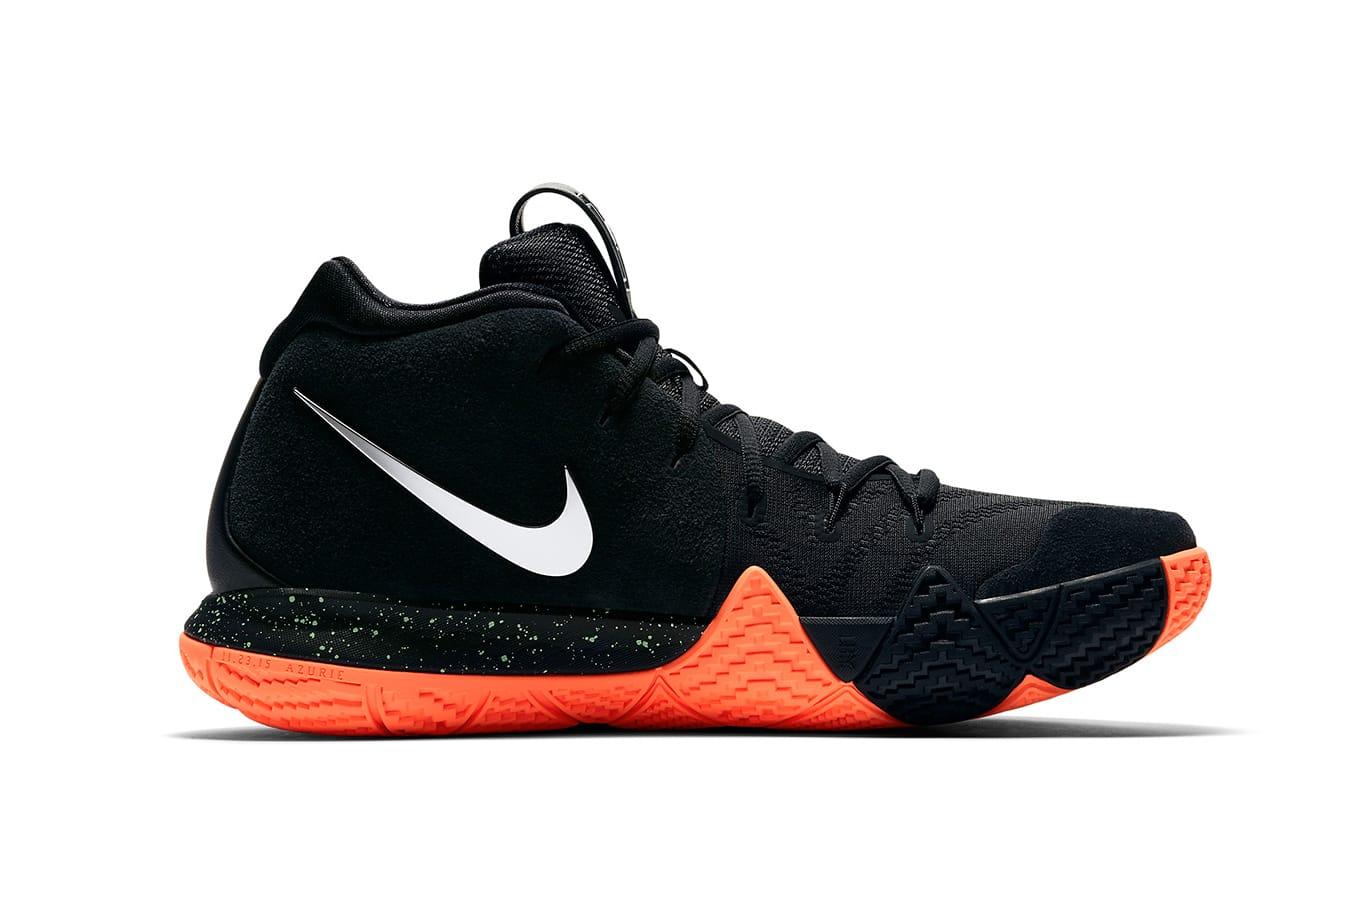 Kyrie 4 Will Drop in Black \u0026 Orange